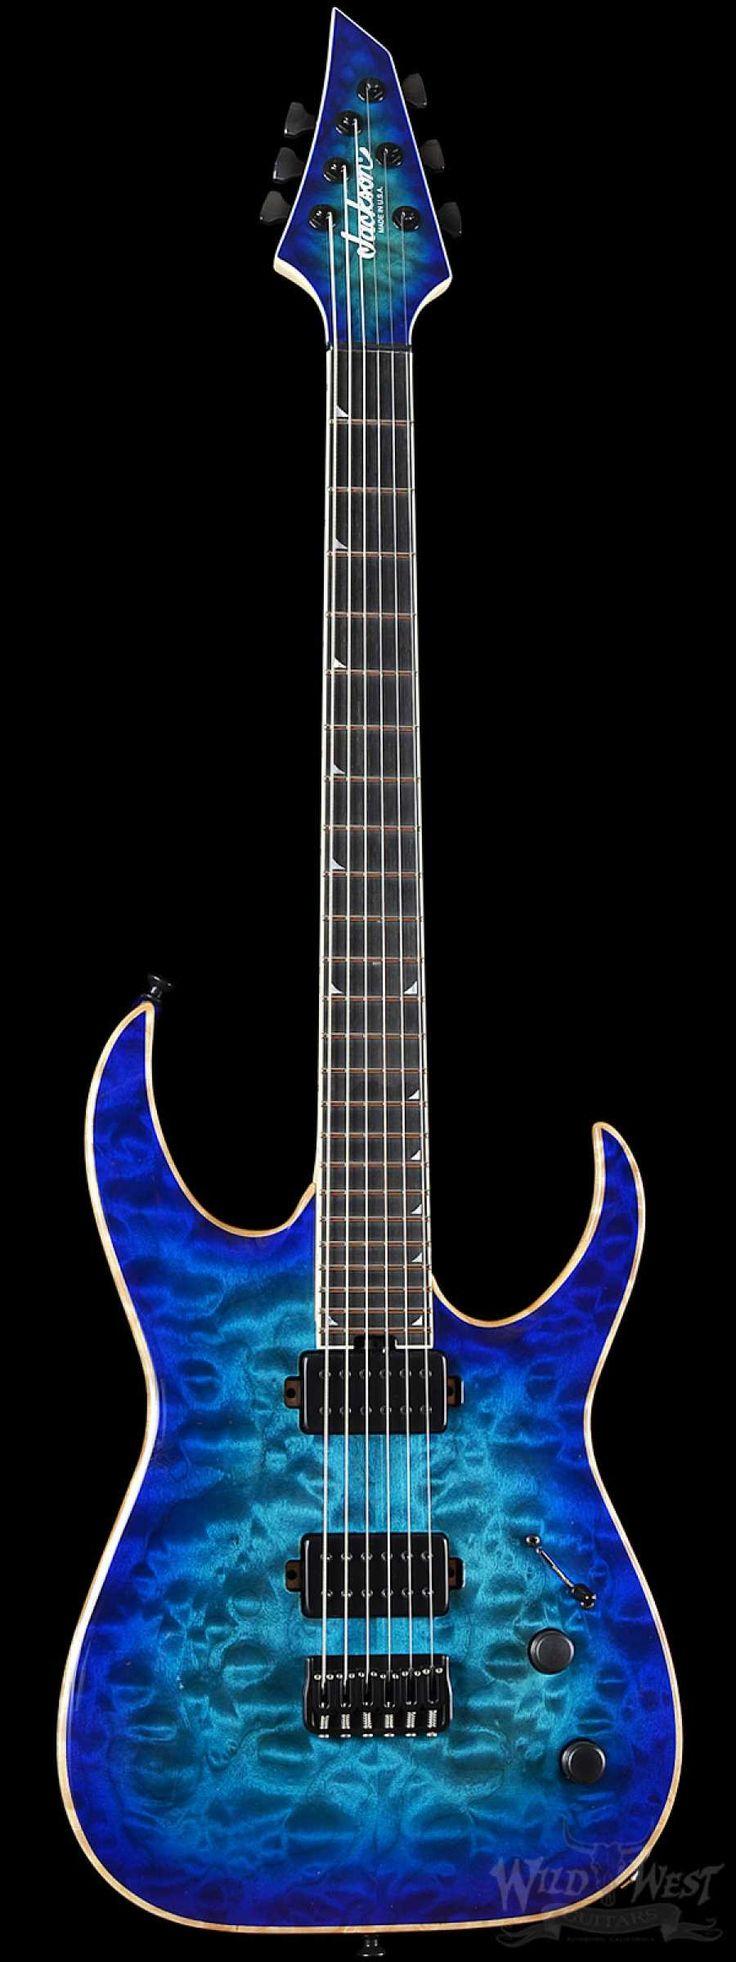 33 best guits and stuff images on pinterest ibanez guitars and jackson misha mansoor juggernaut ht 6 laguna burst wild west guitars asfbconference2016 Images